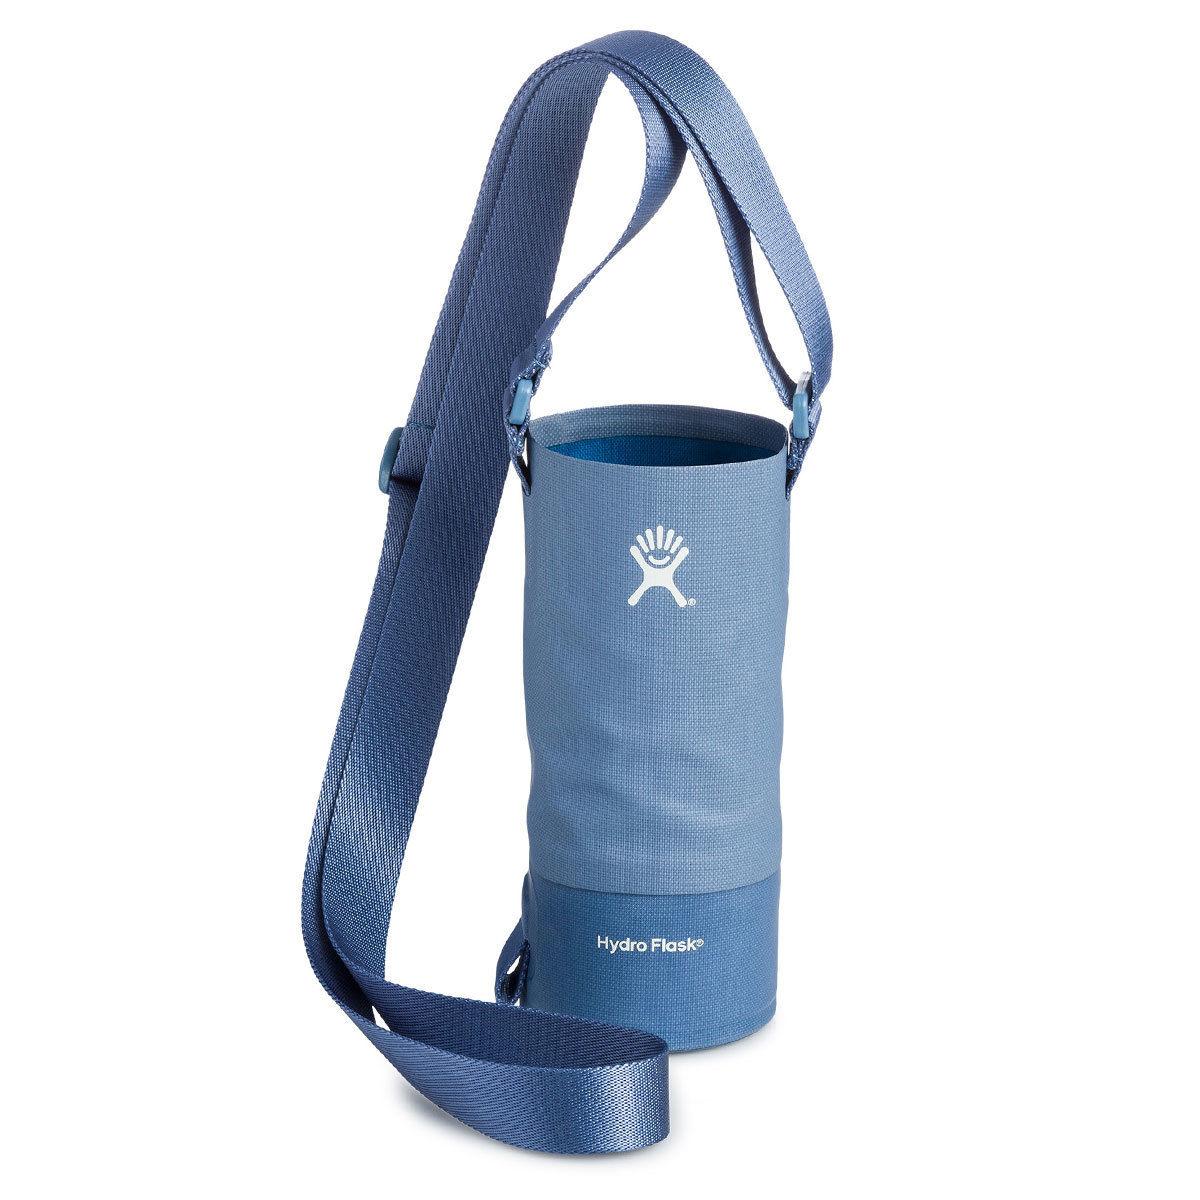 Hydro Flask Standard Tag Along Water Bottle Sling